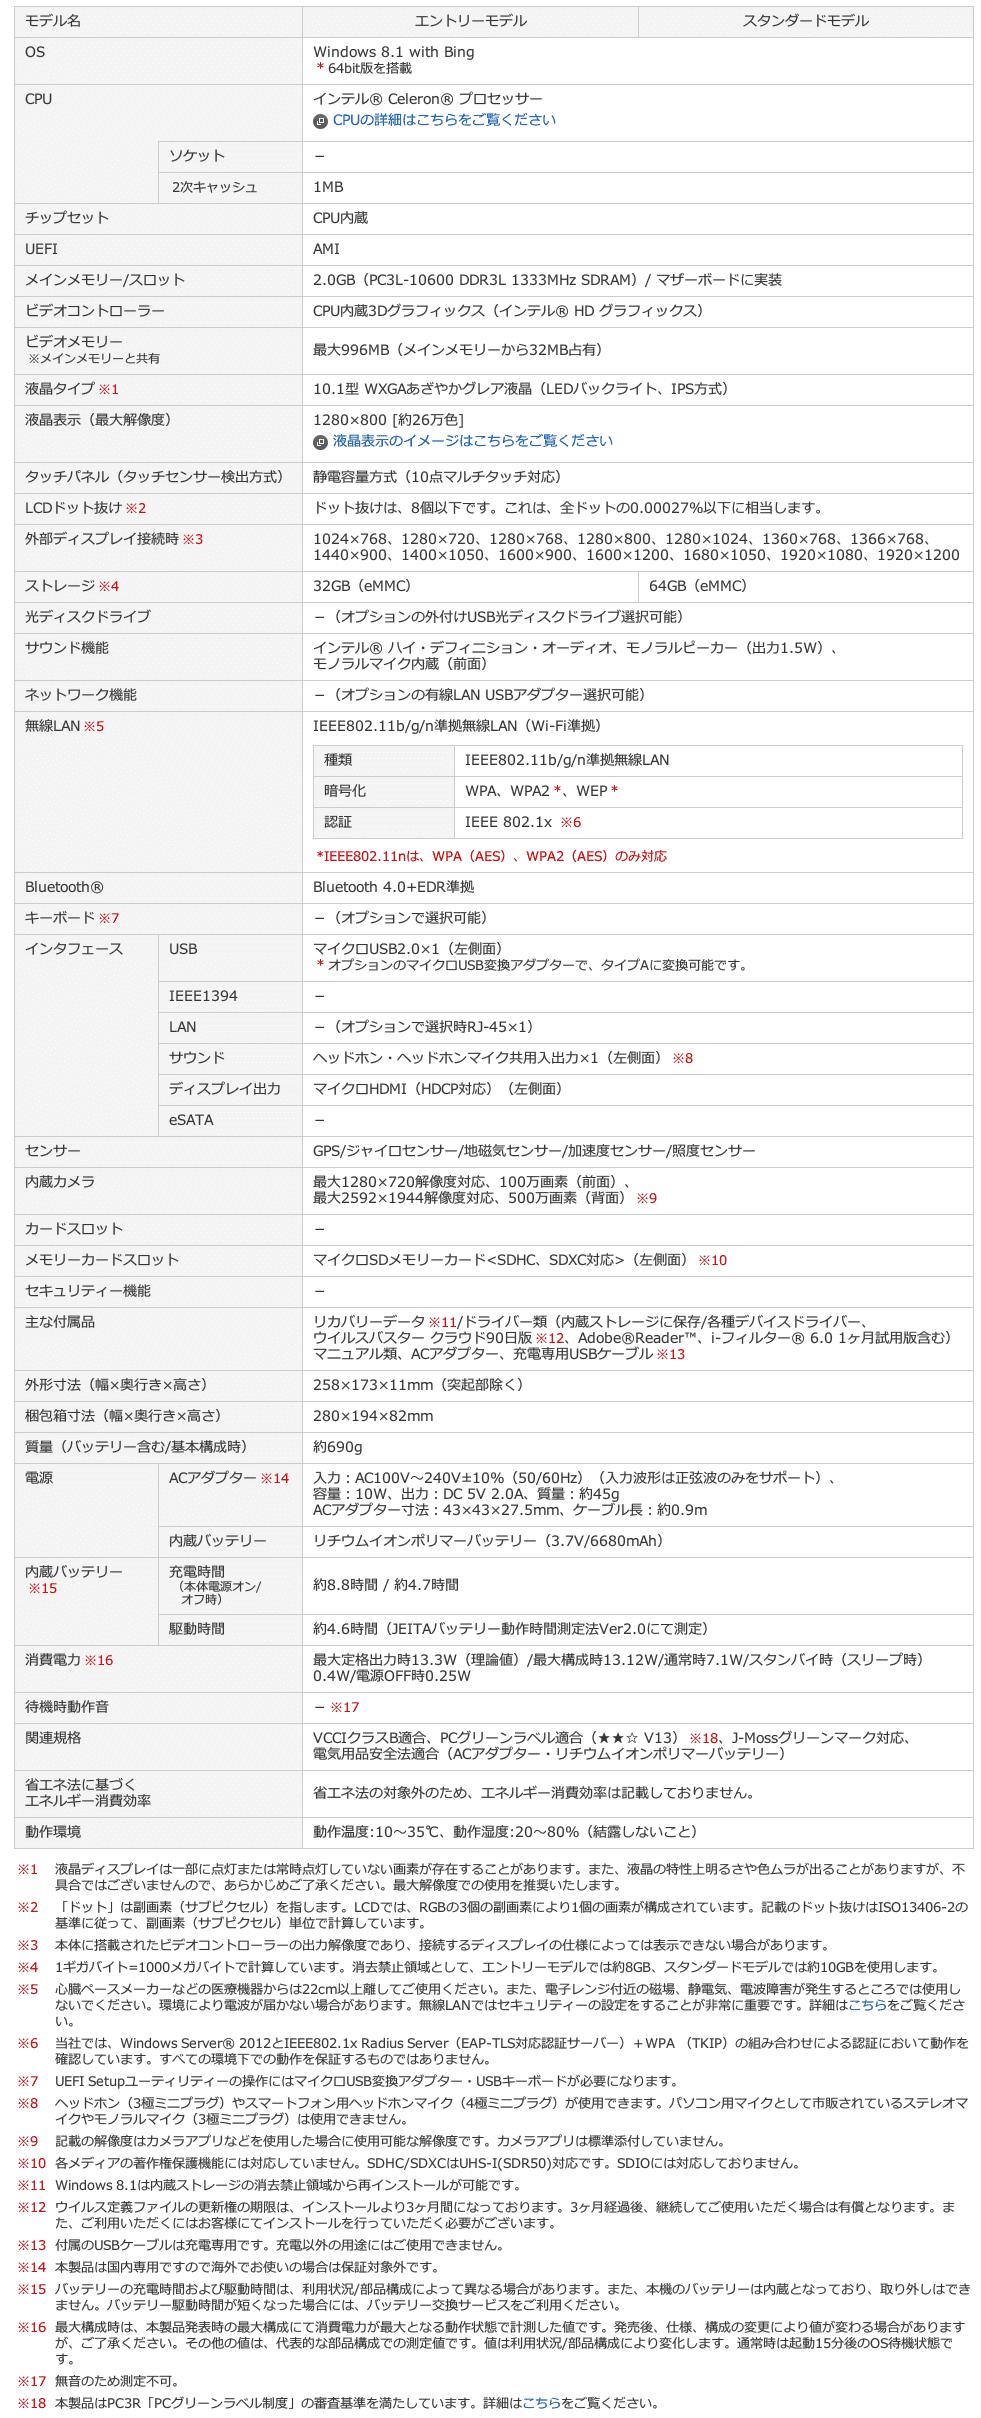 Endeavor TB20Sのスペック表